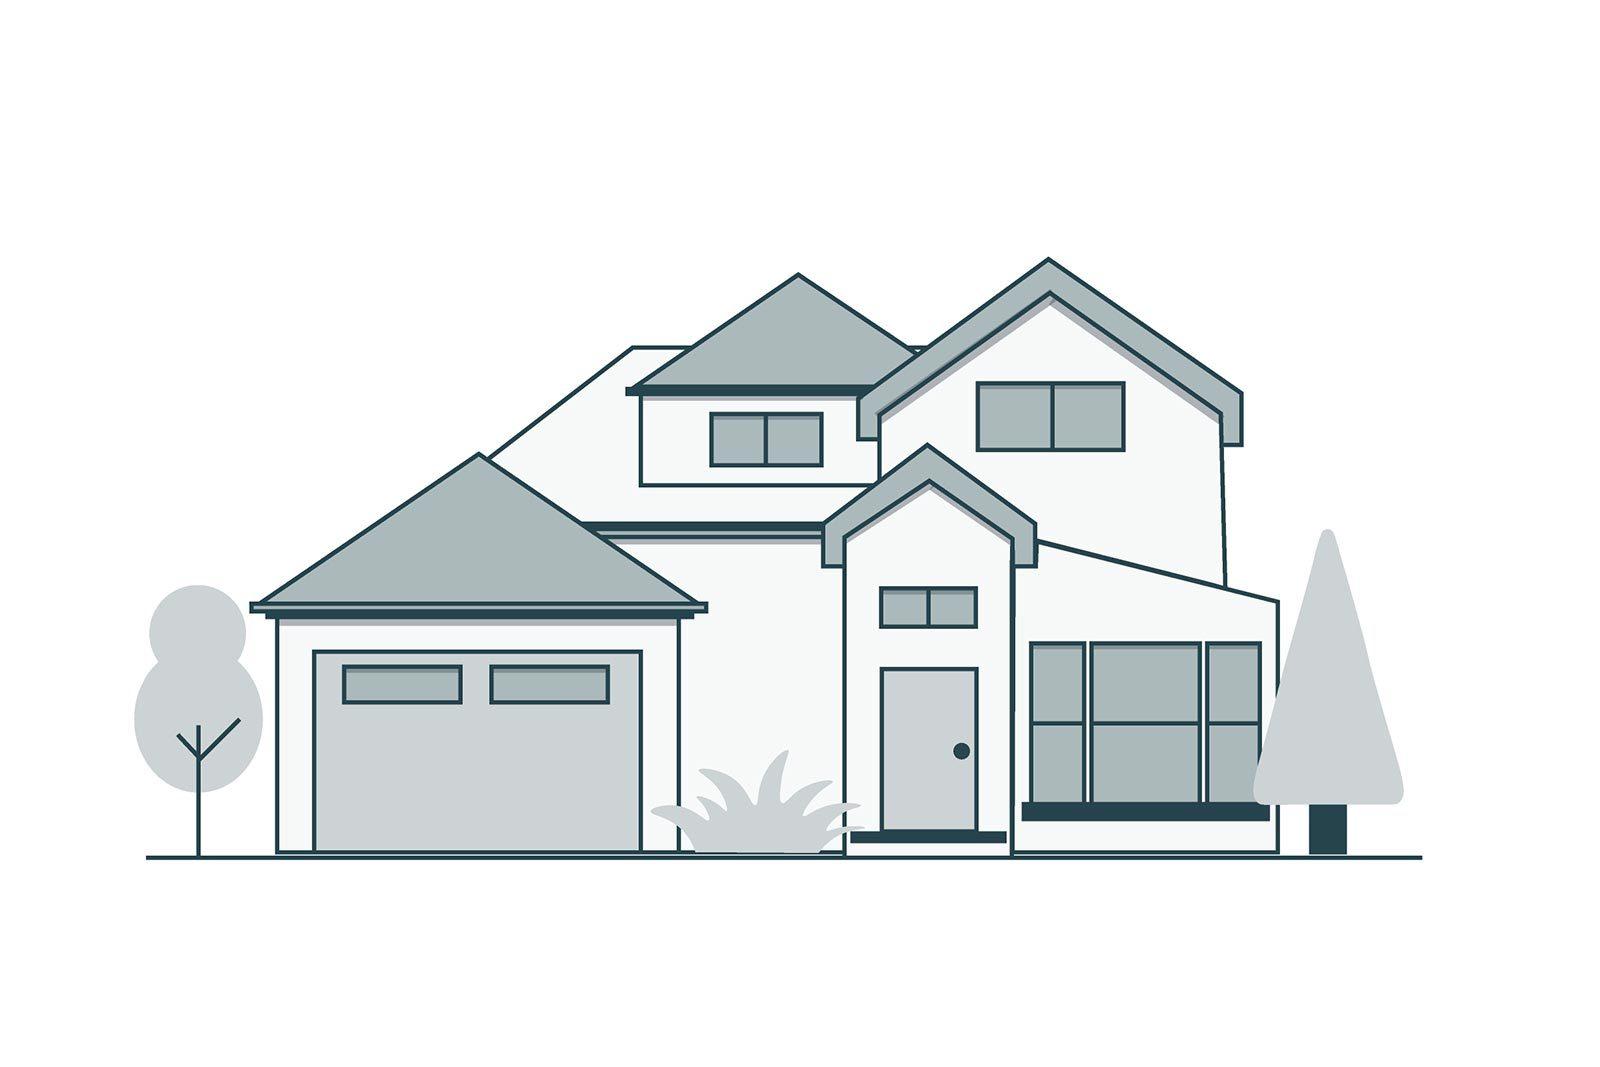 275 Dalewood Way San Francisco, CA 94127